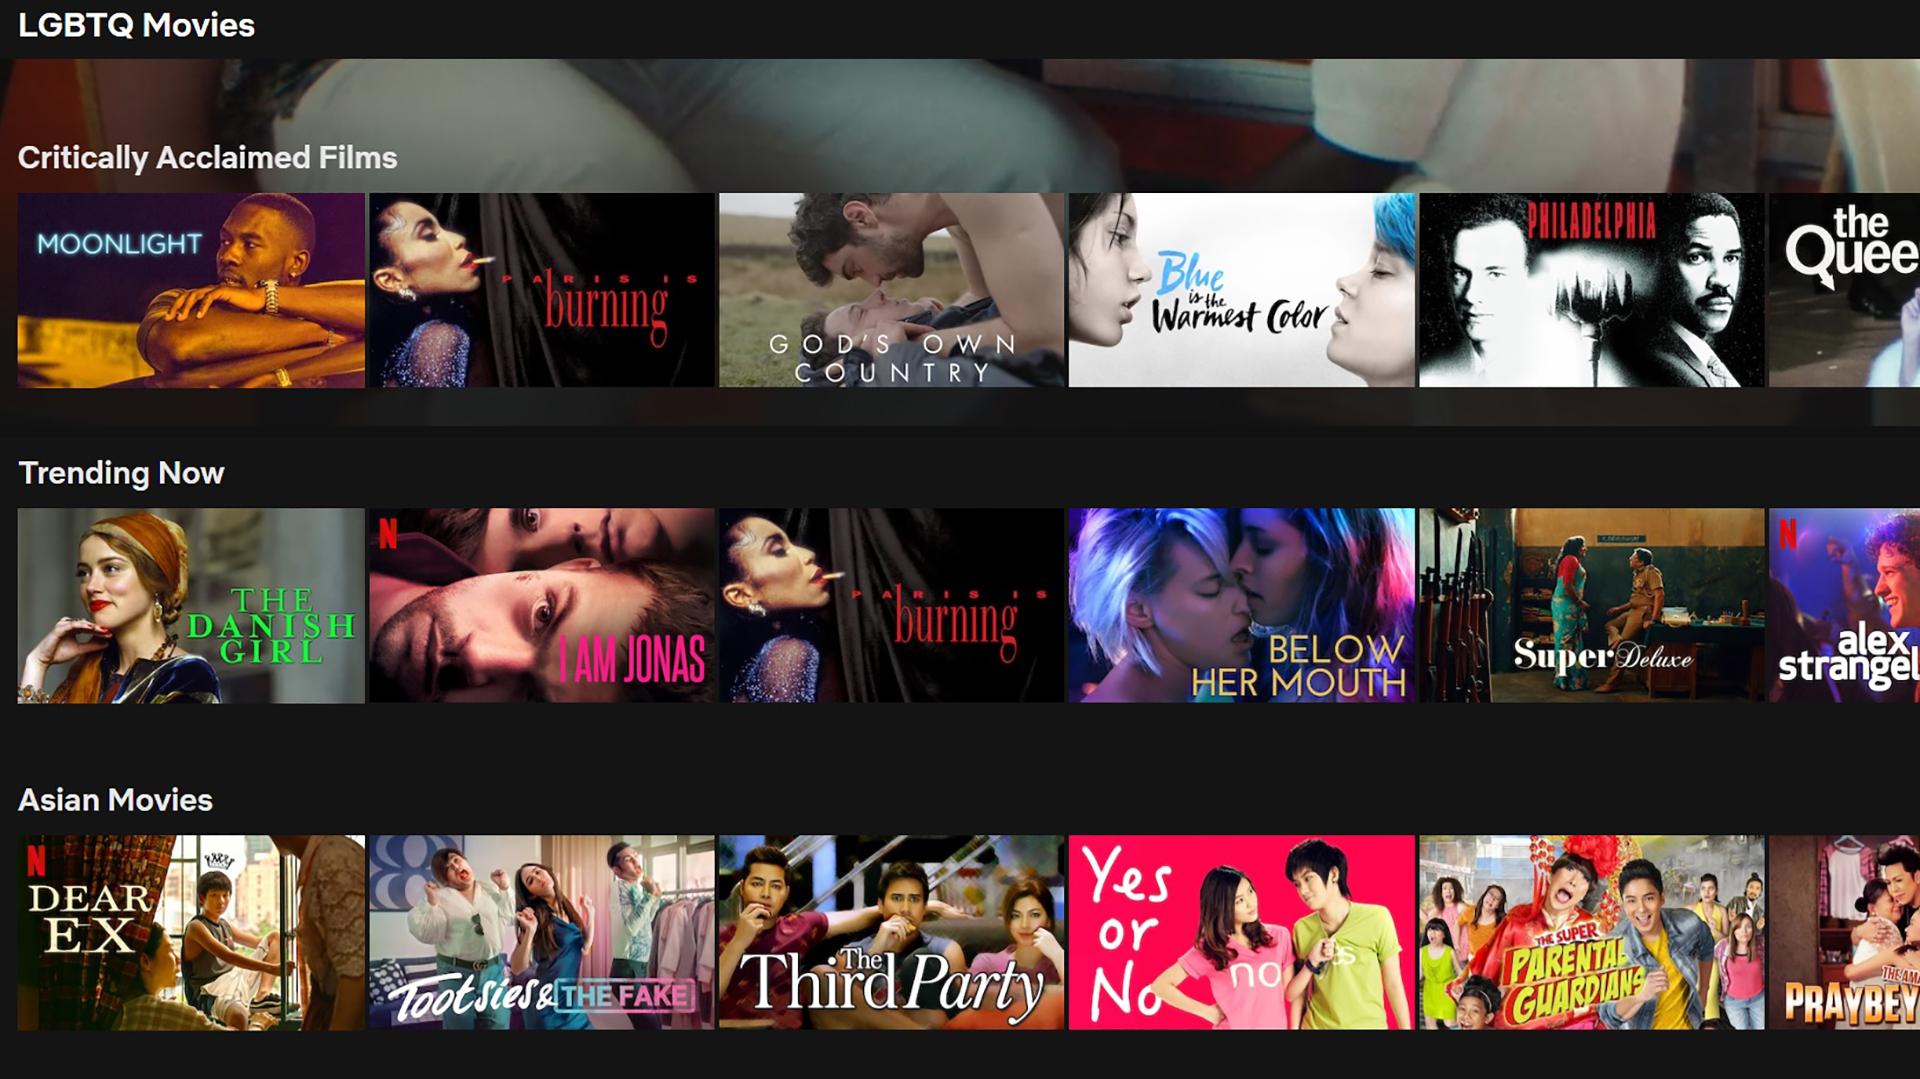 Best LGBT Movies On Netflix